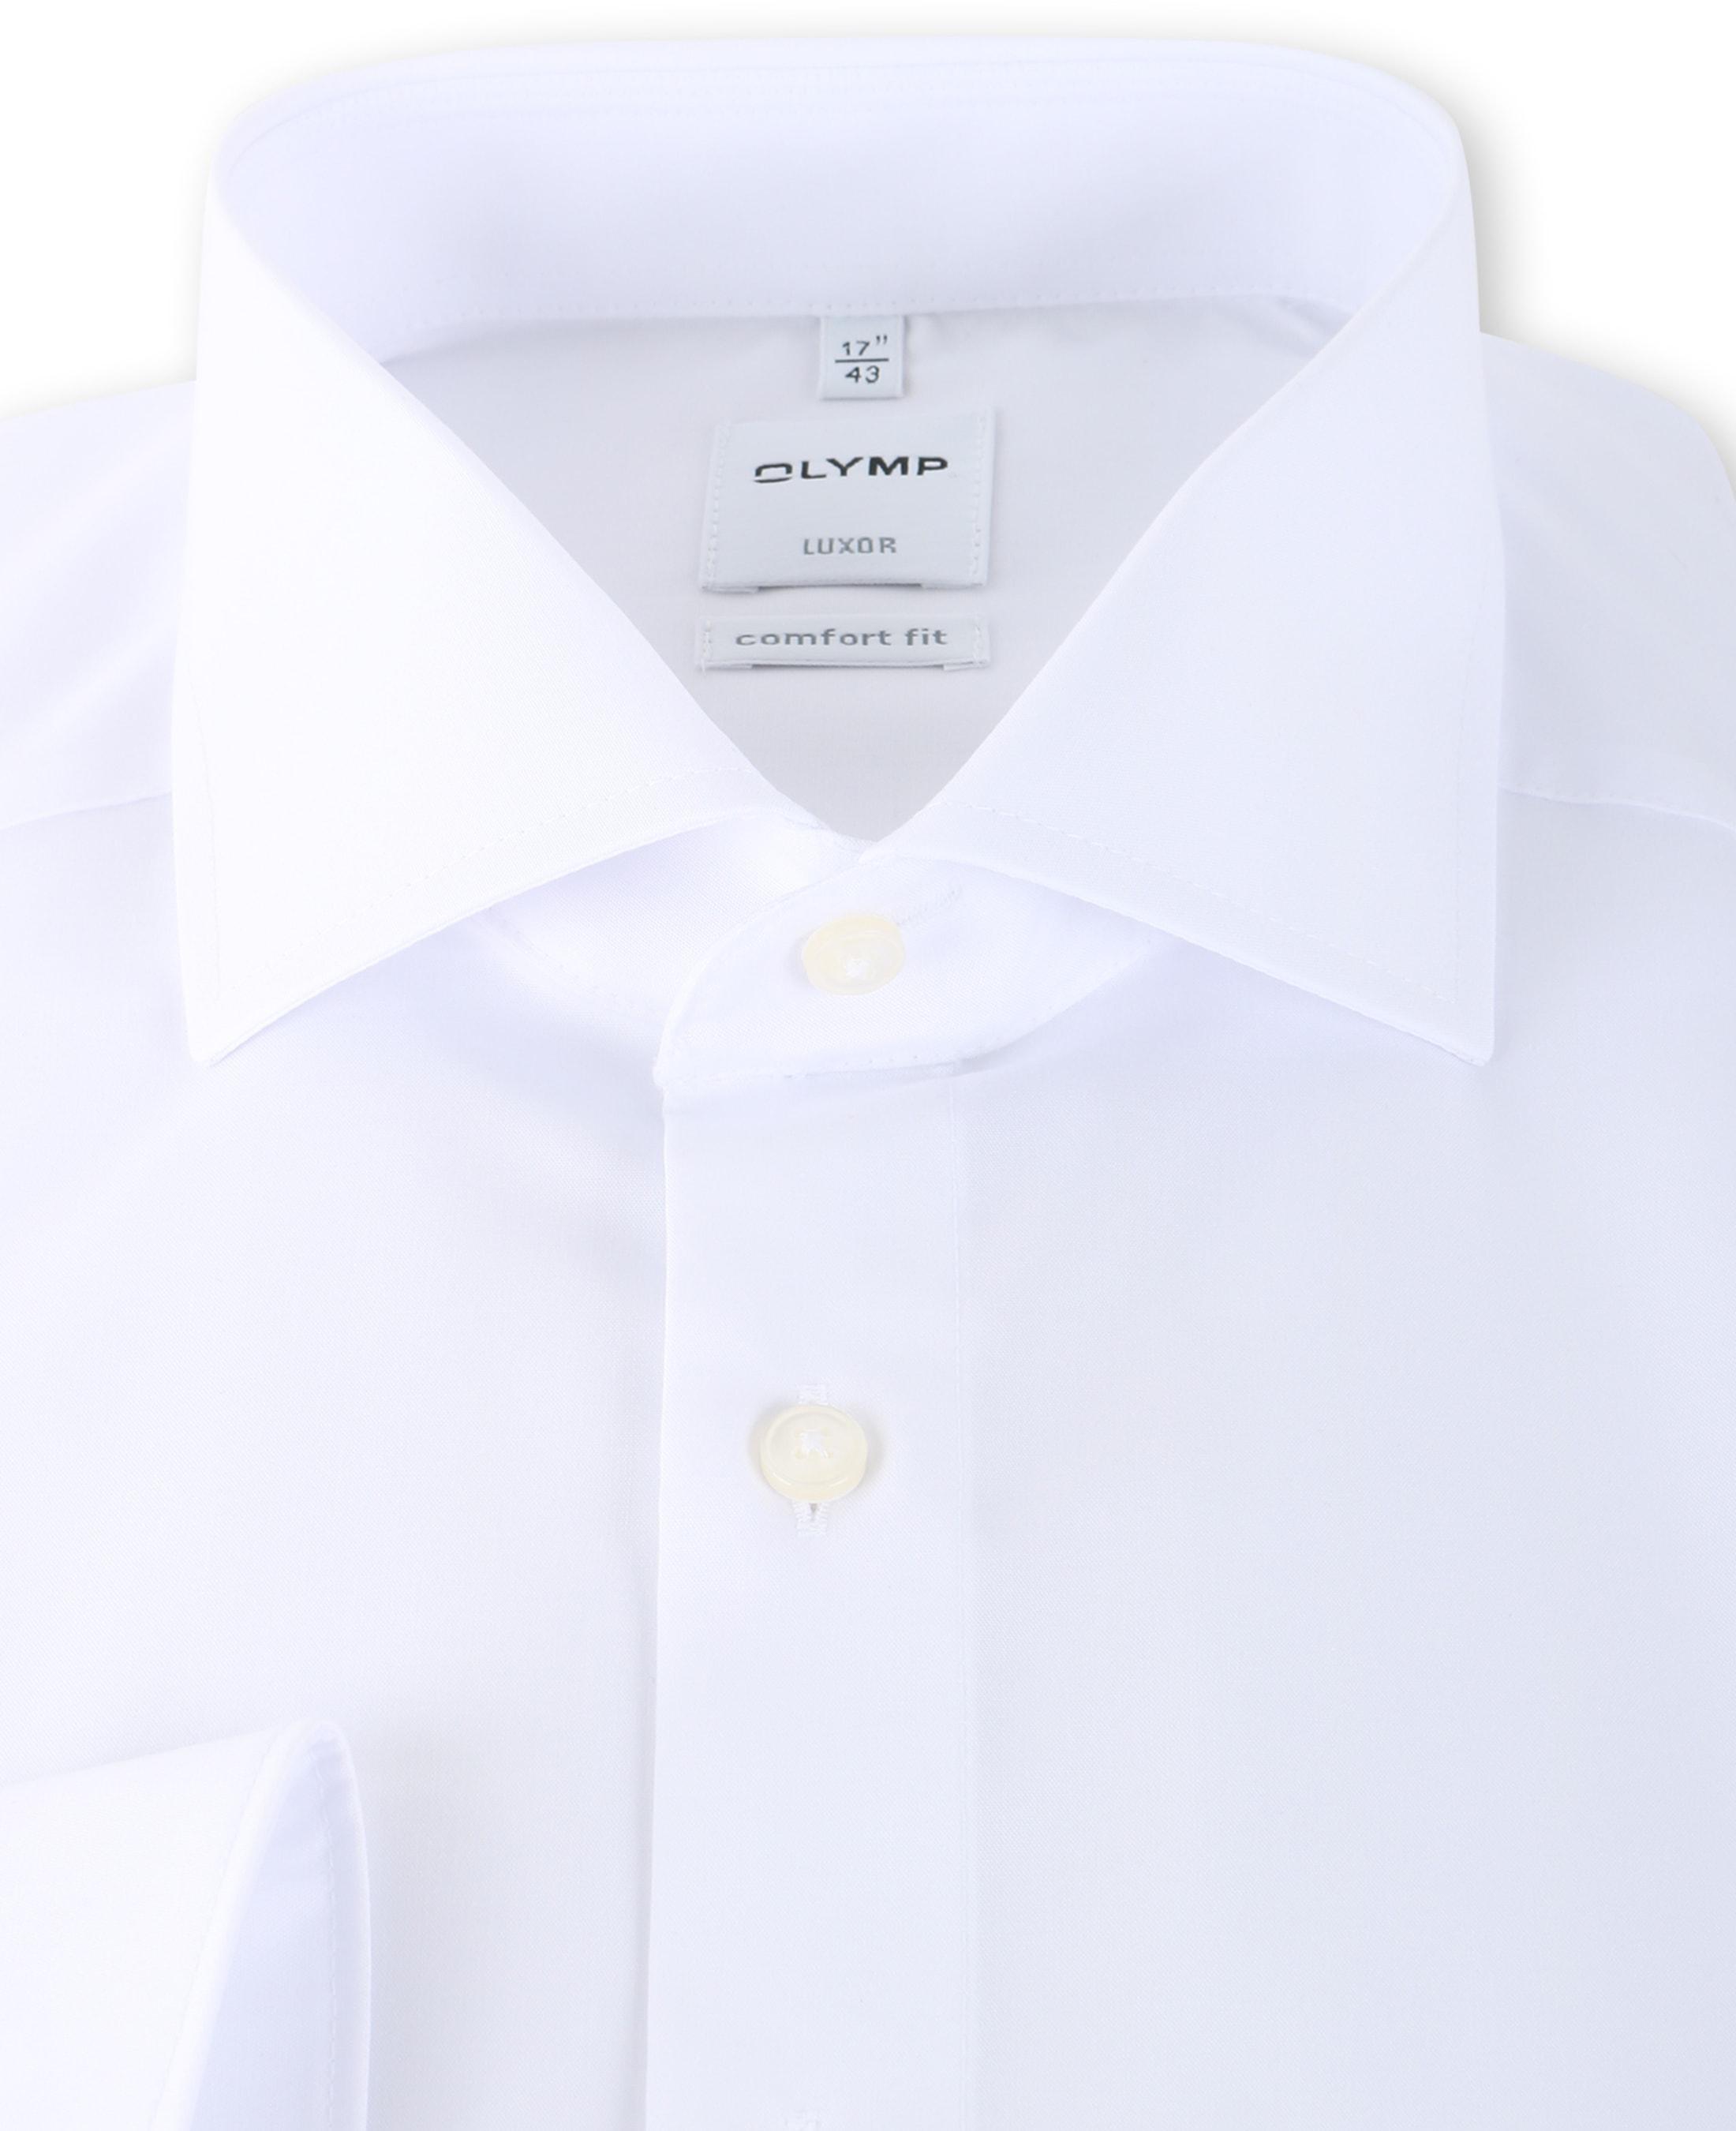 OLYMP Luxor Shirt Comfort Fit Cutaway foto 2